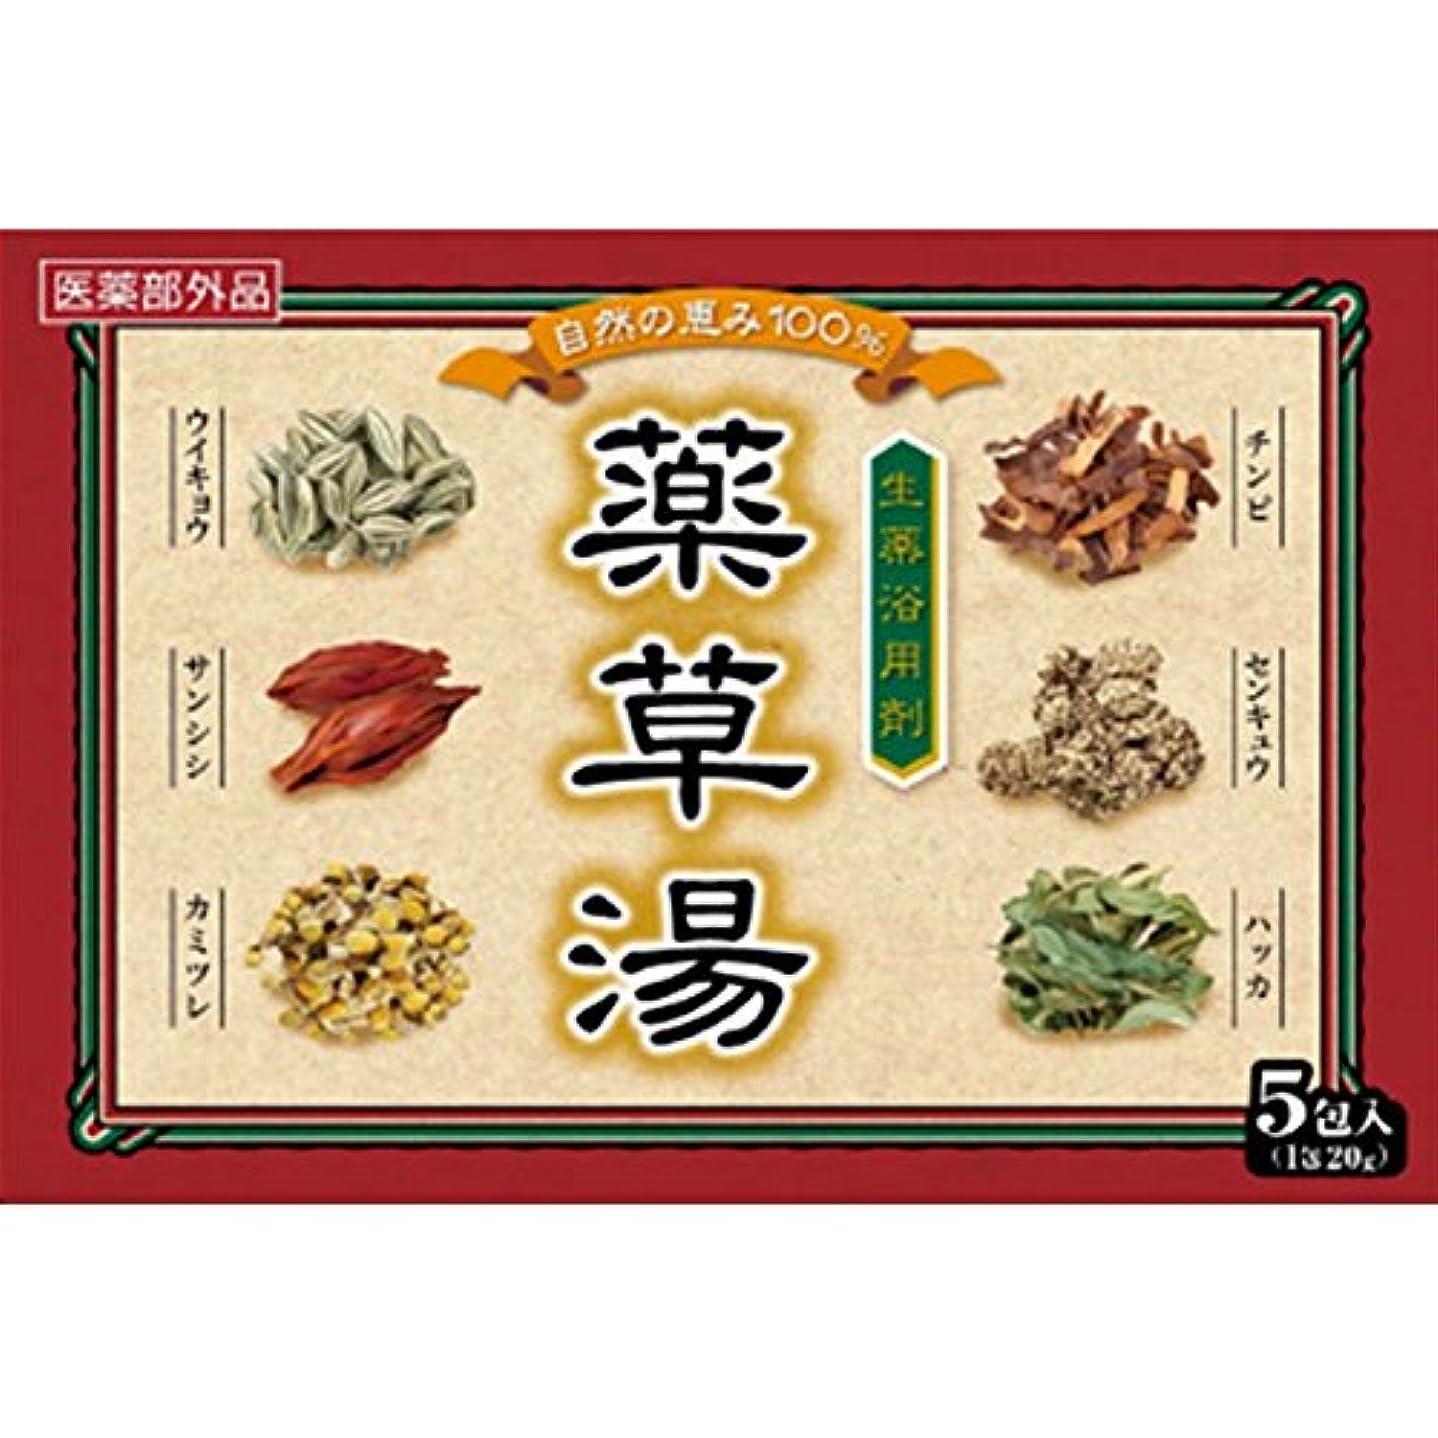 愛撫ポップ北西生薬浴用剤 薬草湯5包×5